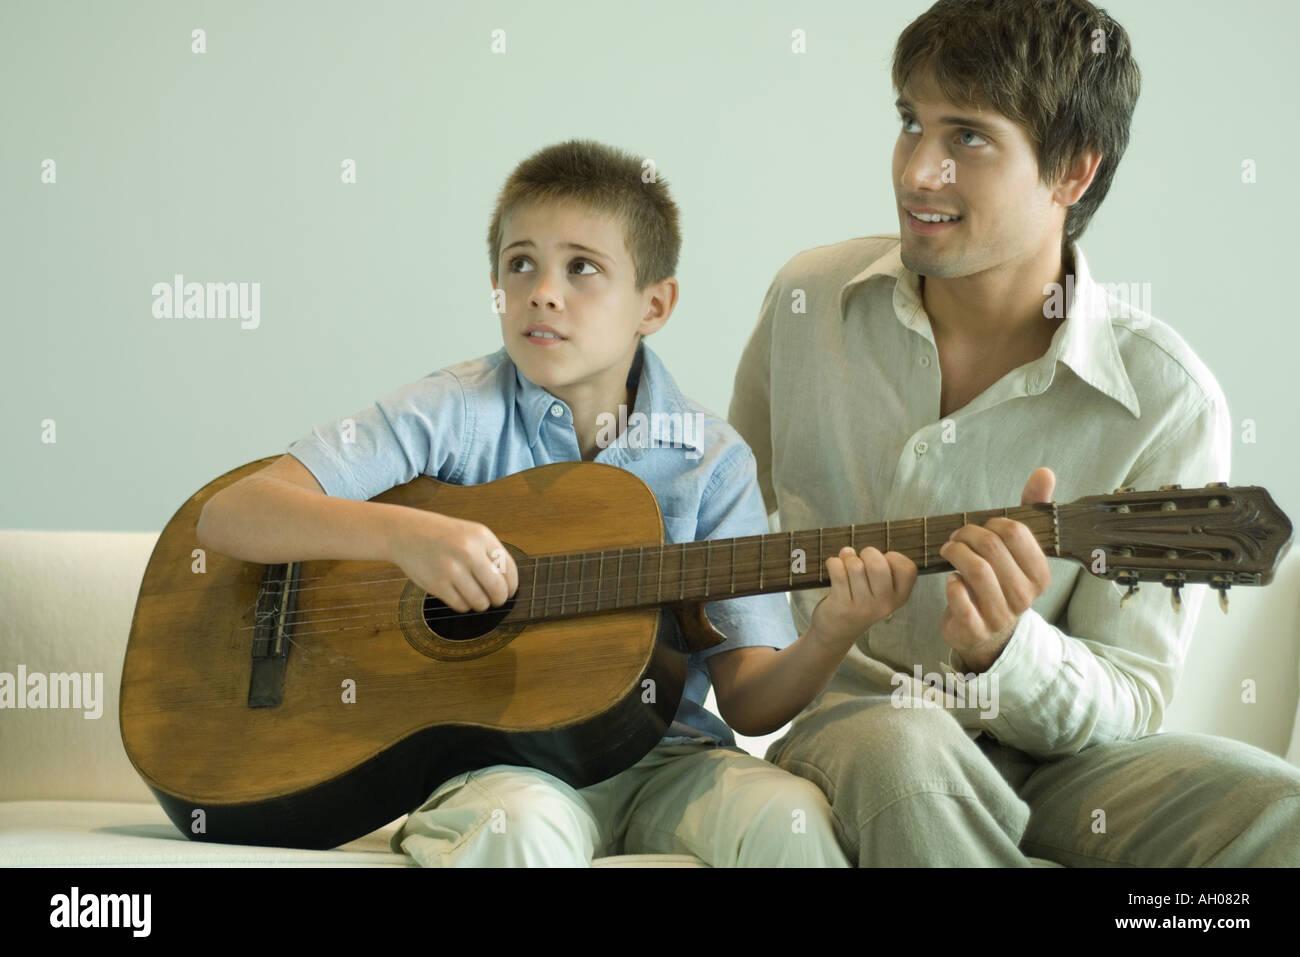 Man teaching boy to play the guitar Stock Photo